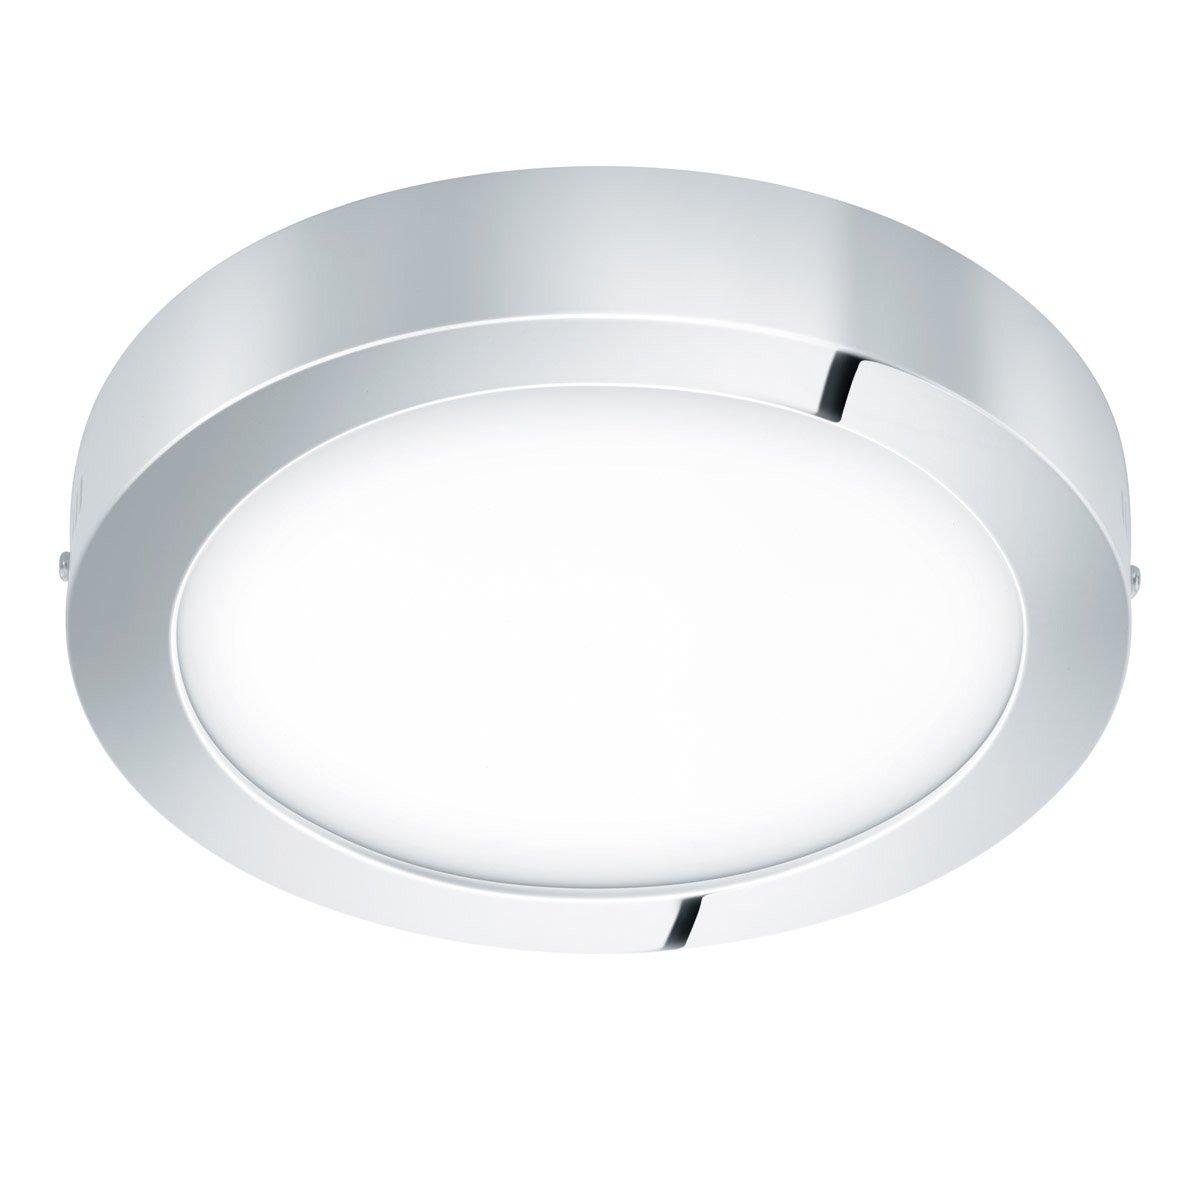 Eglo Chrome plafondlamp Fueva 1 Eglo 96246